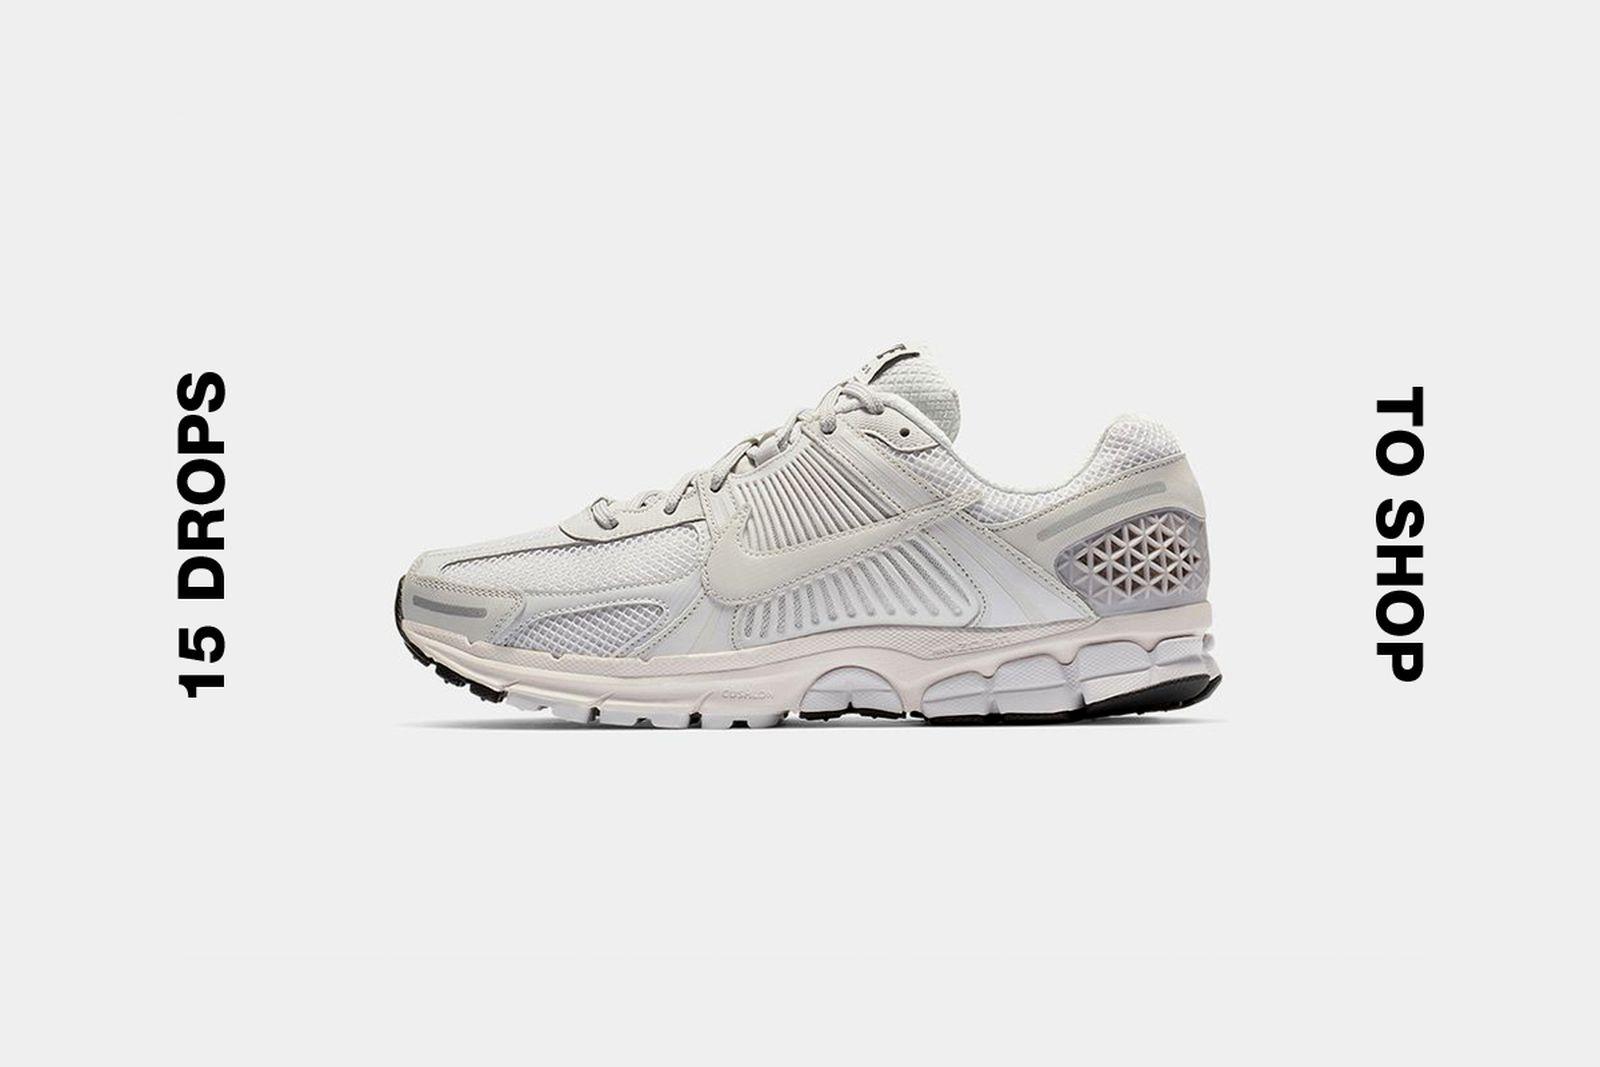 nikelab zoom vomero 5 sp best drops buy Converse Nike Air Max 720 asics